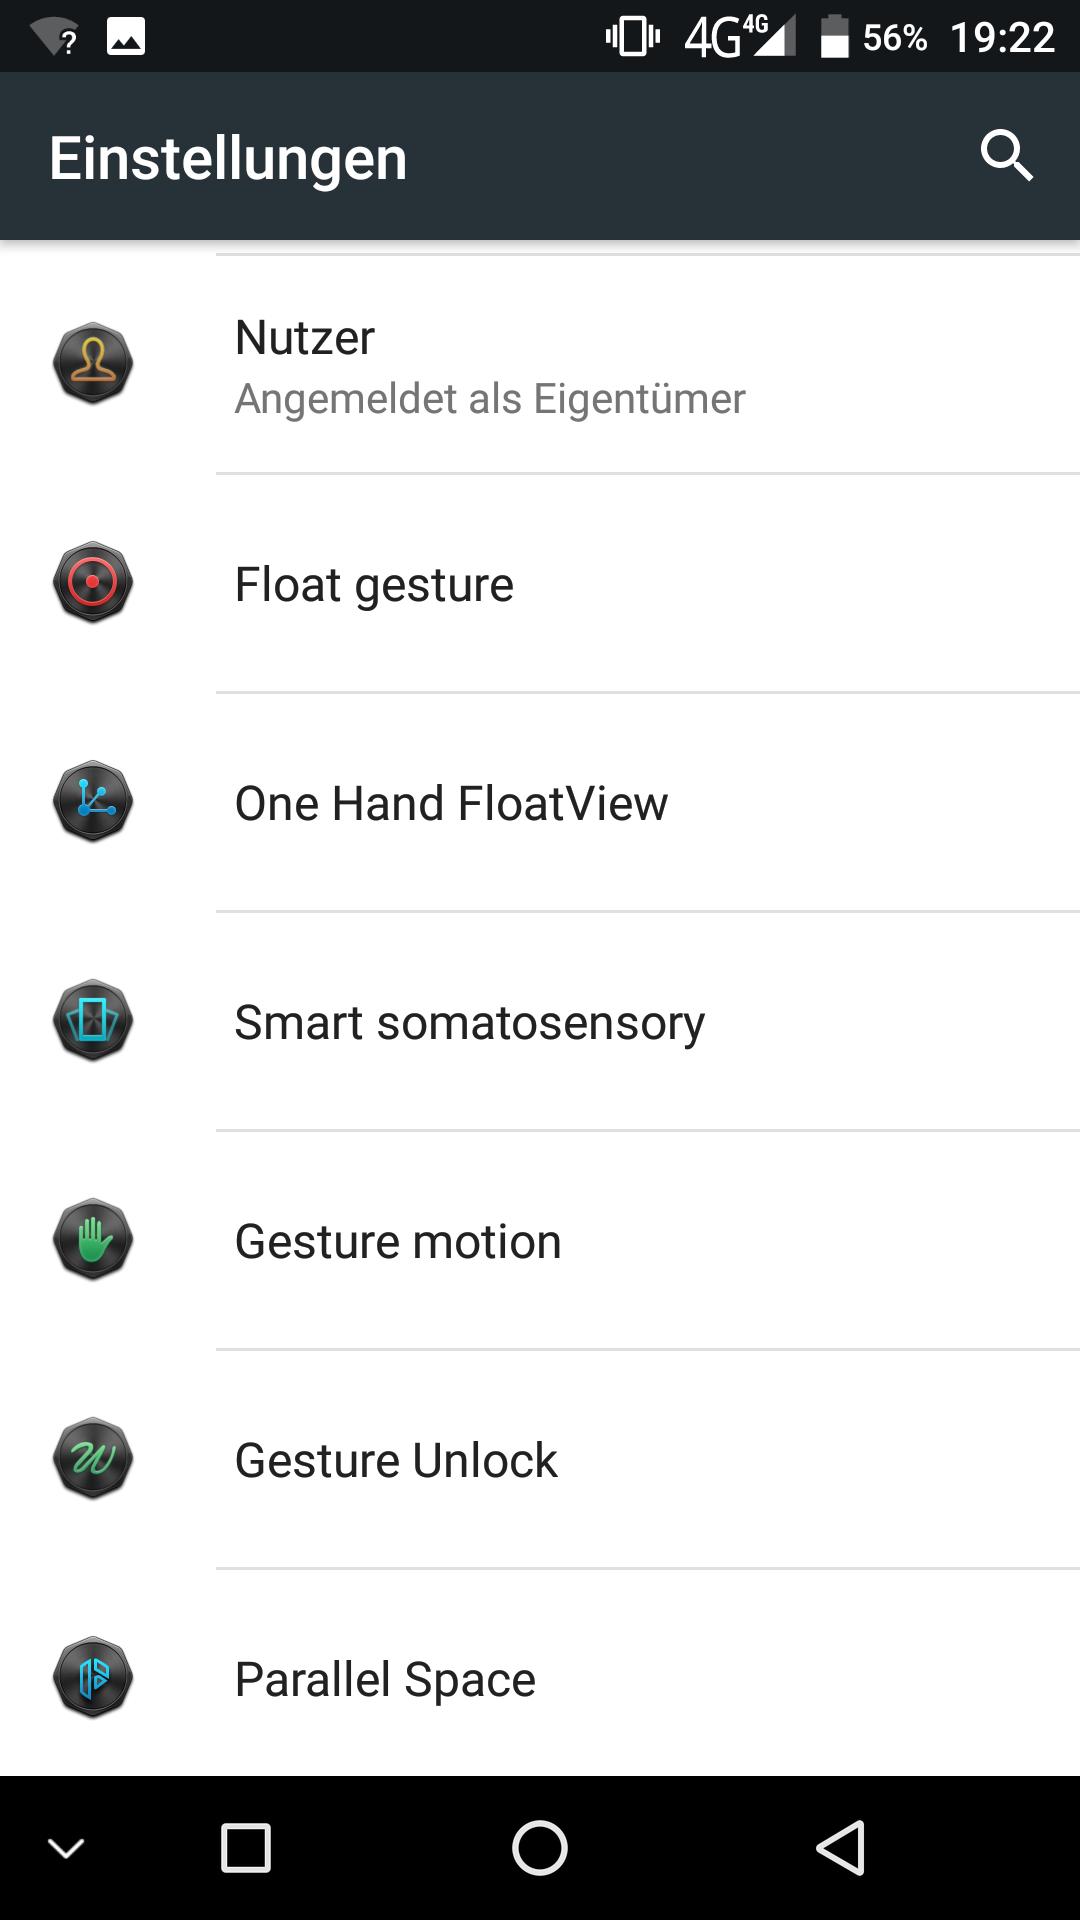 UlefonePowerII android5